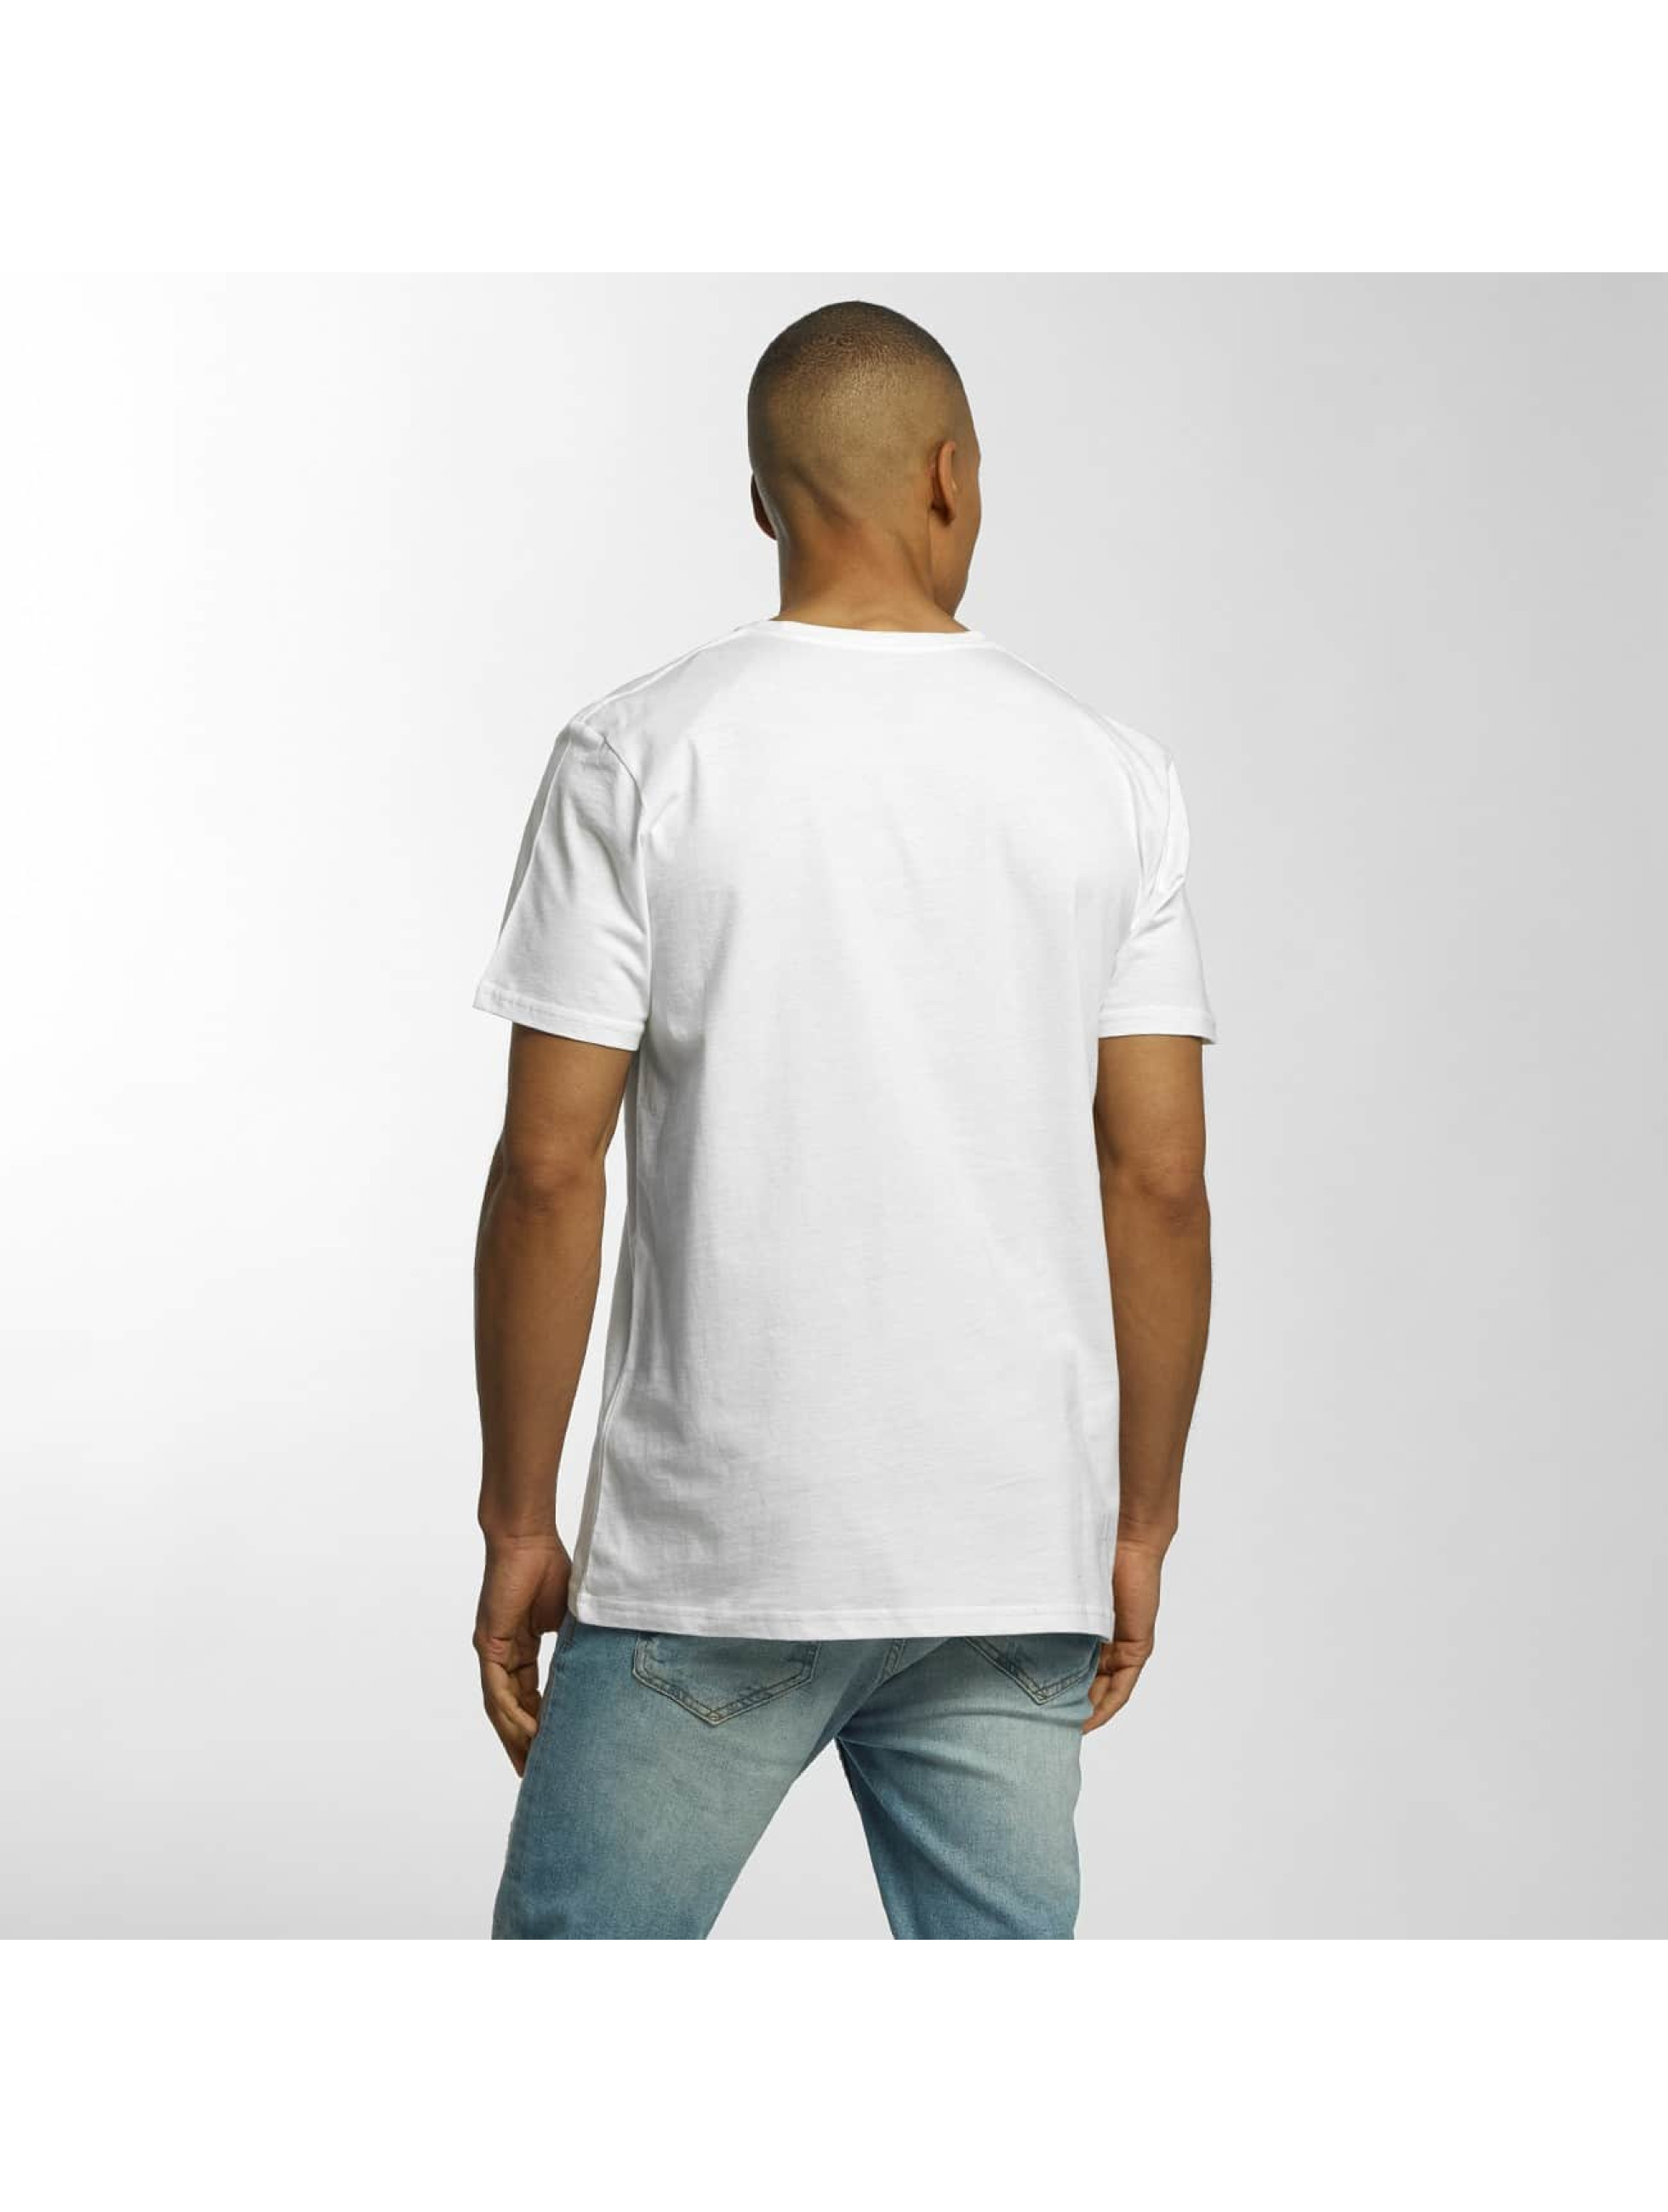 Quiksilver T-shirt Classic Sea Tales bianco